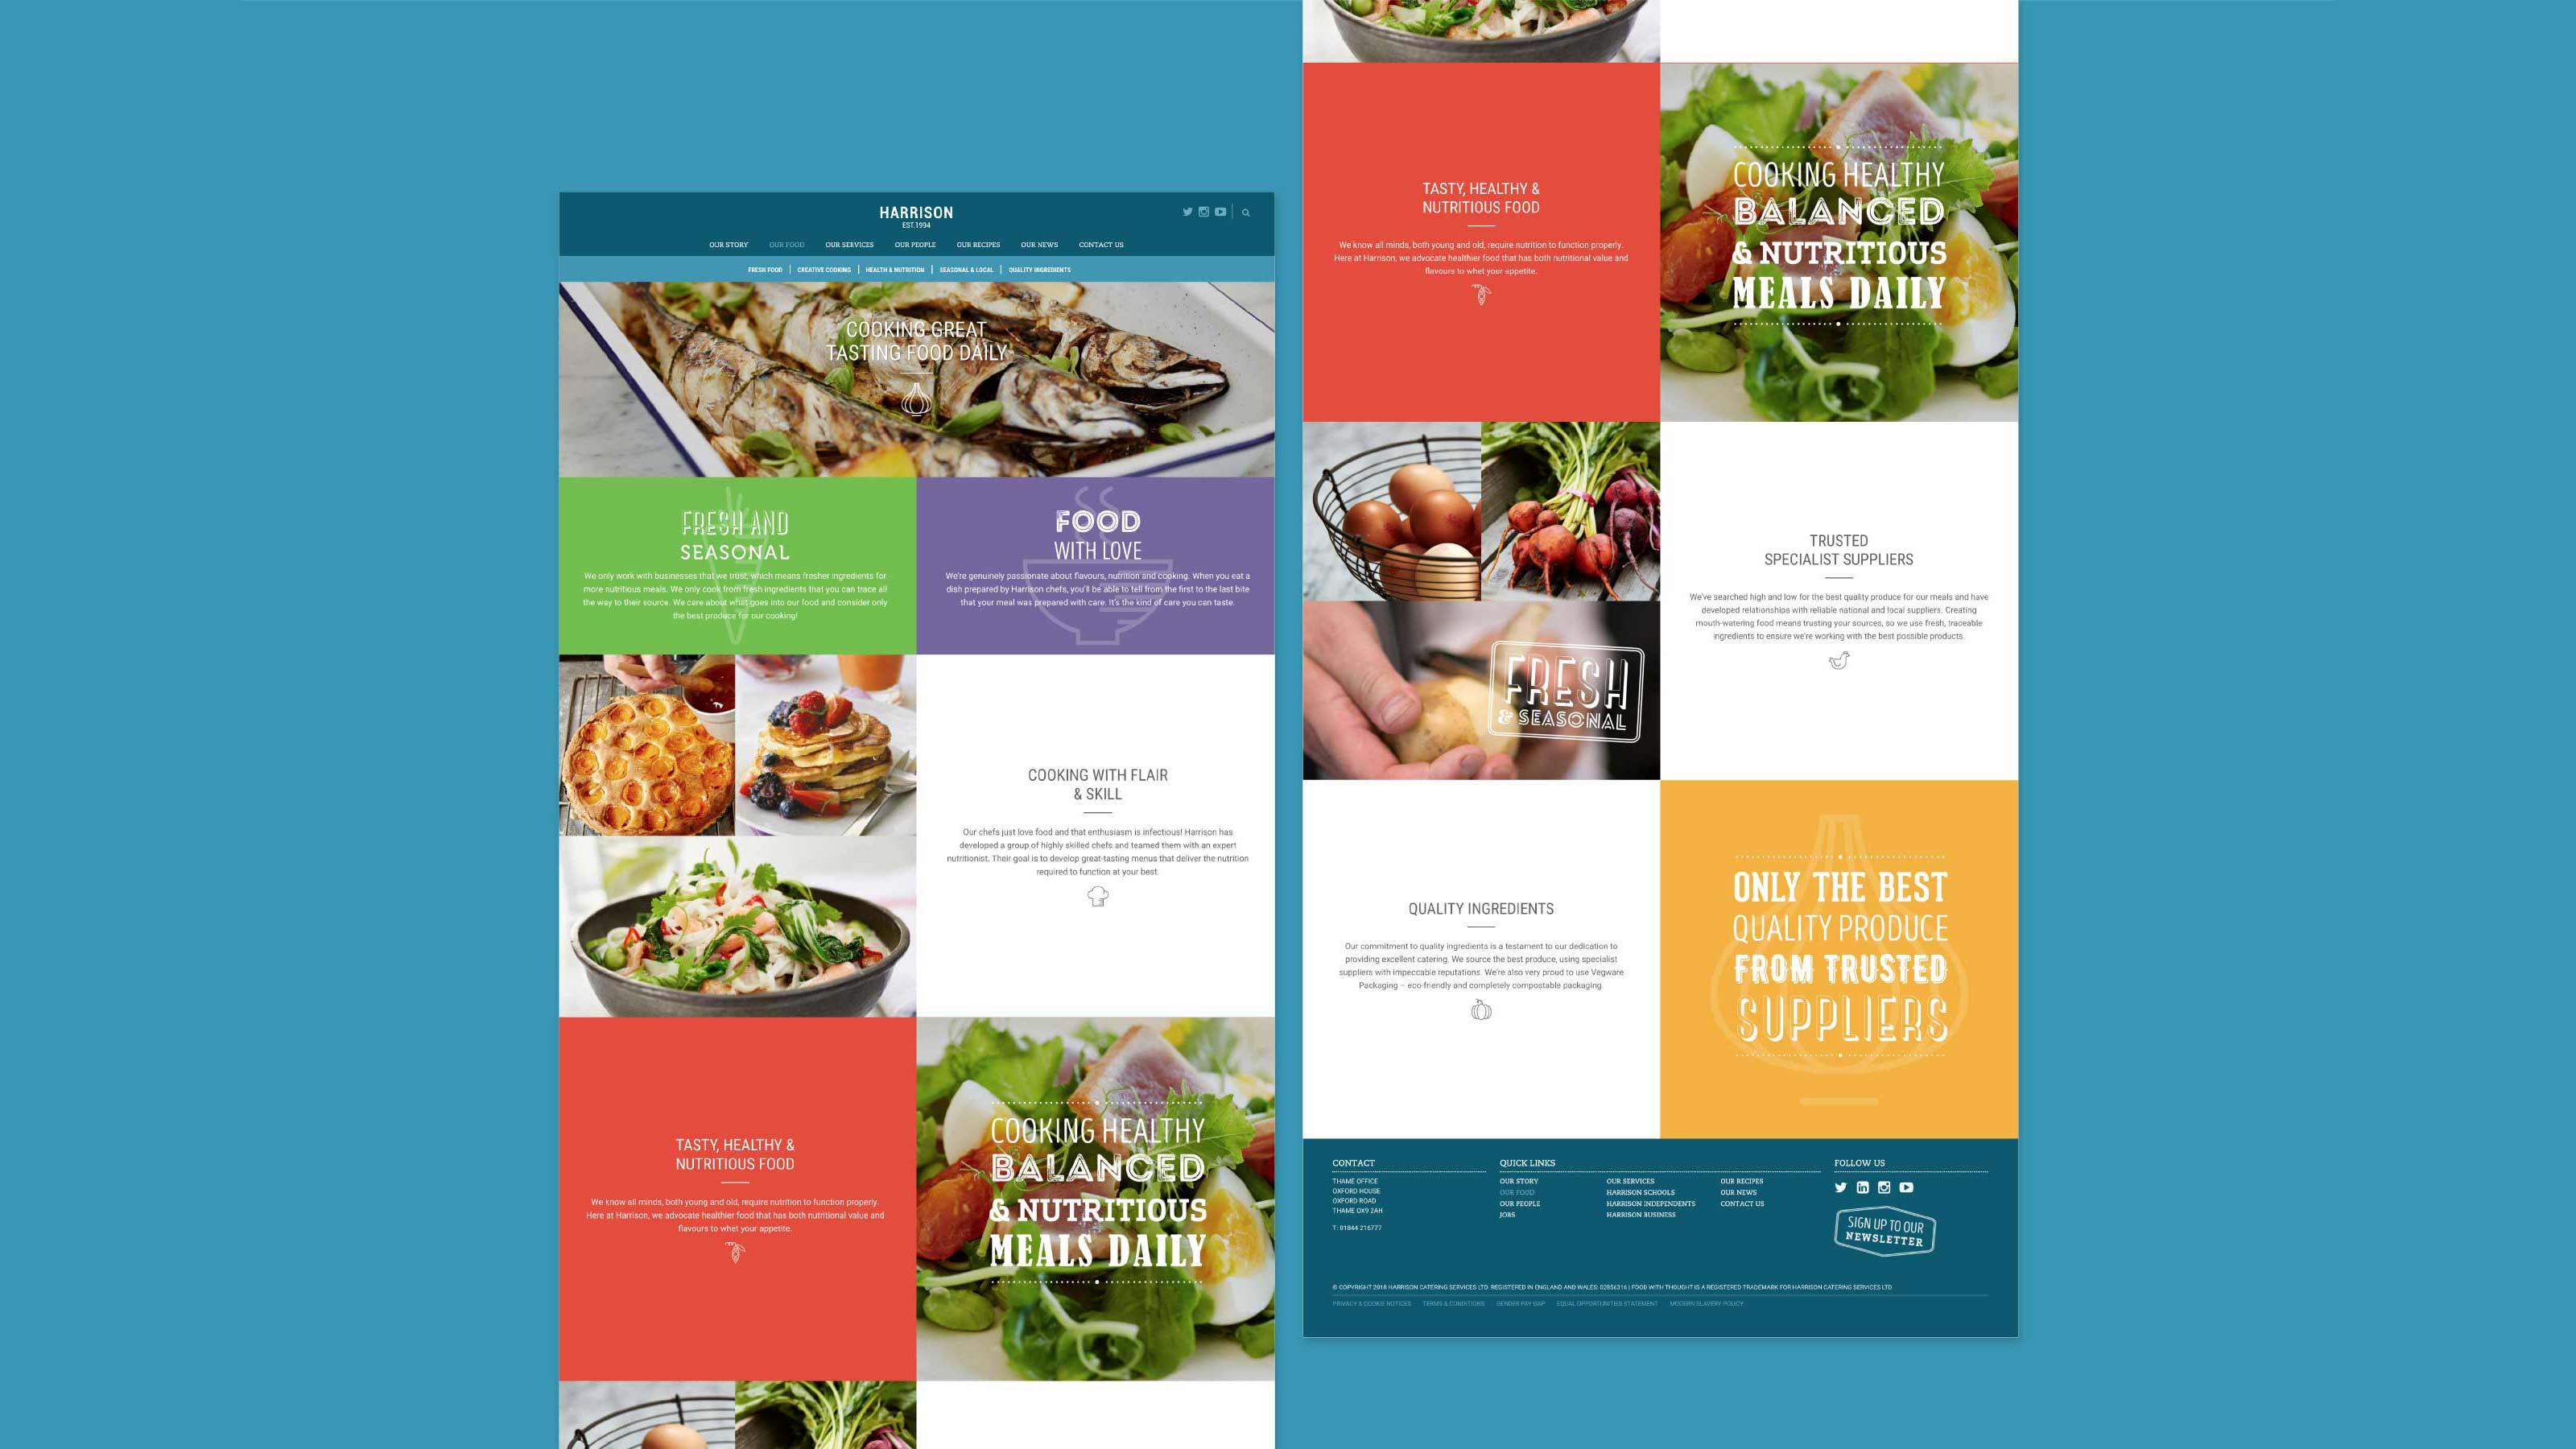 Harrison Digital web pages design